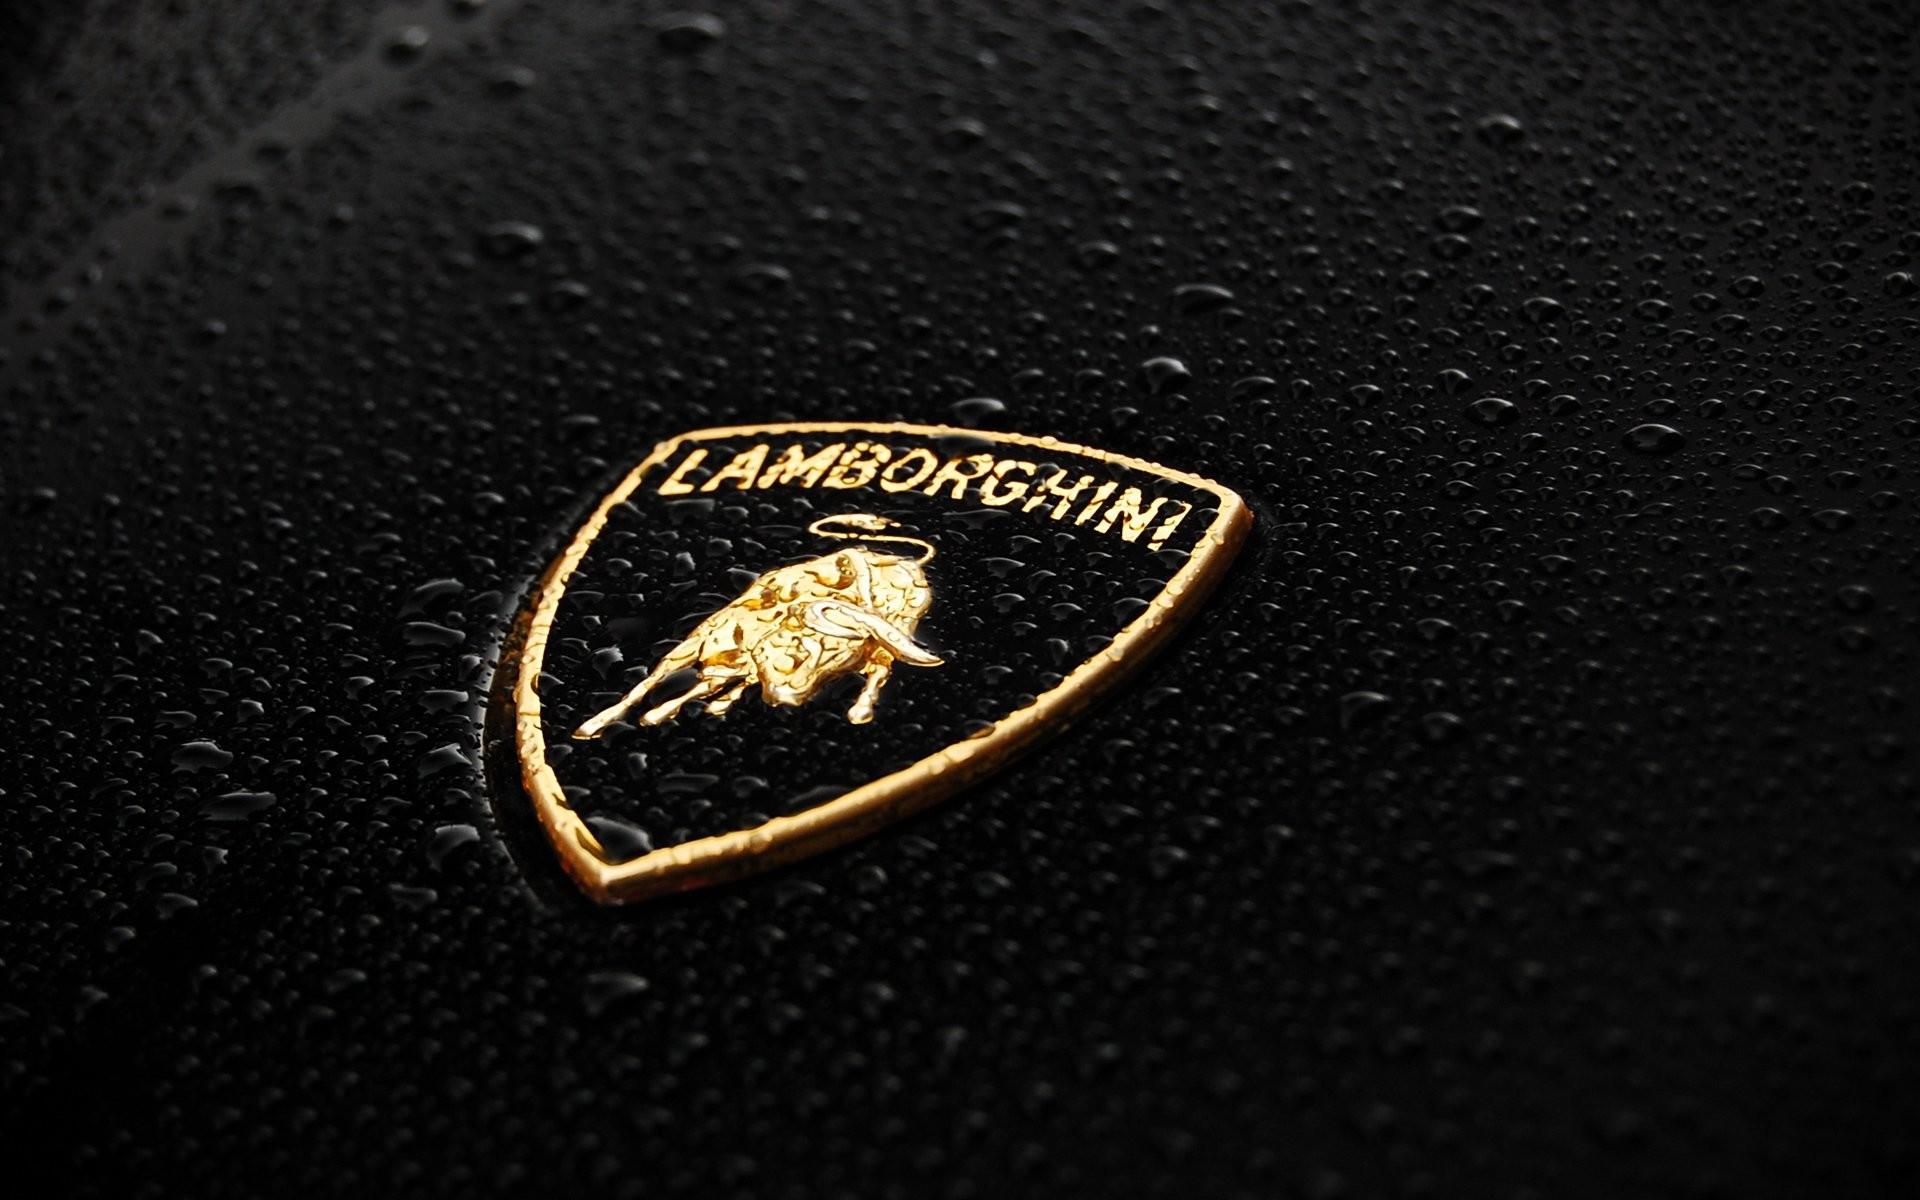 Lamborghini Logo Wallpaper 795409. TAGS: Cool Bulls Logo Lamborghini Chicago